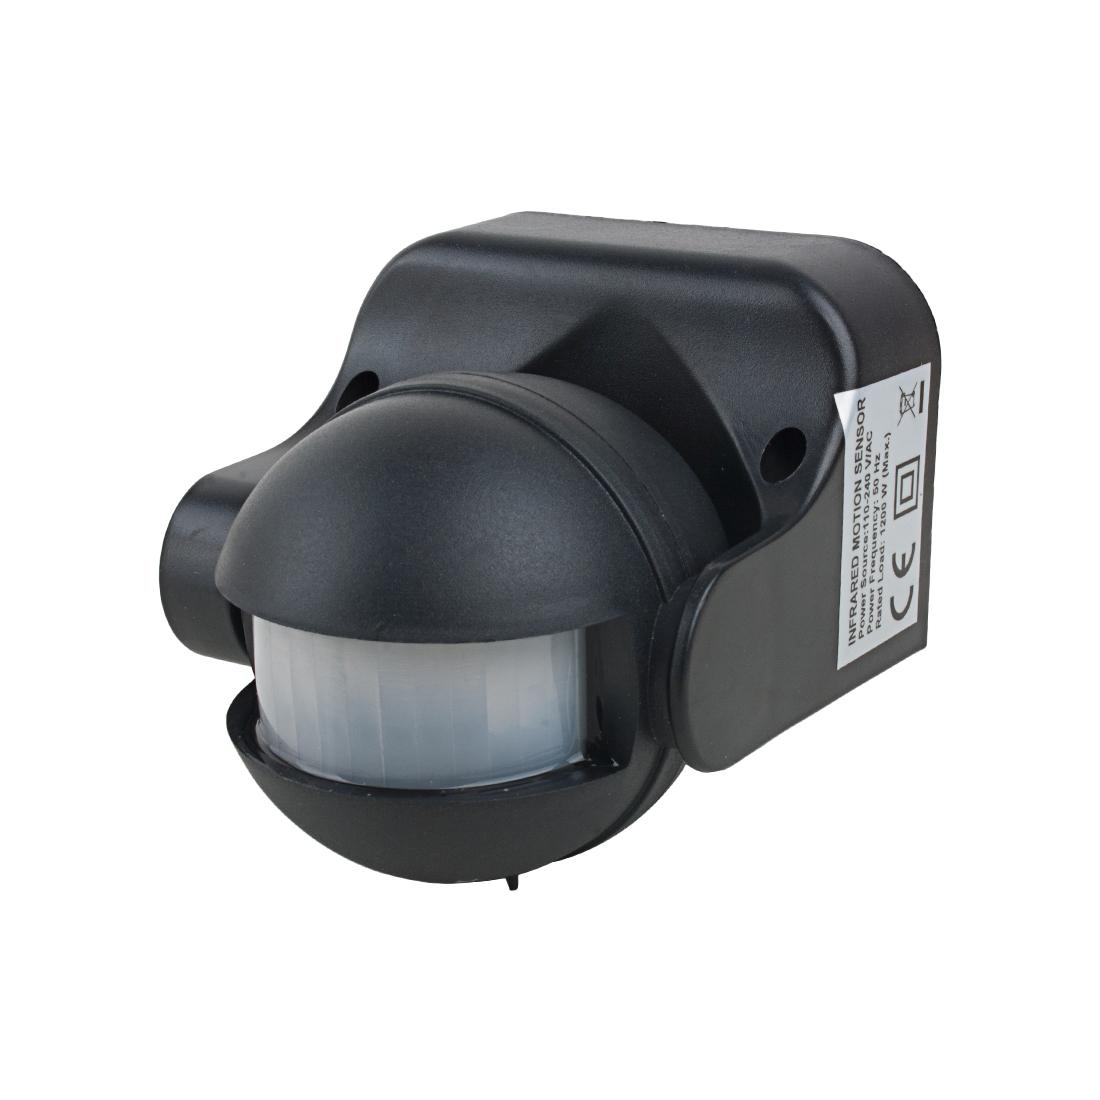 AC110V-240V Outdoor Human Body Infrared Detector Motion Sensor Switch Black